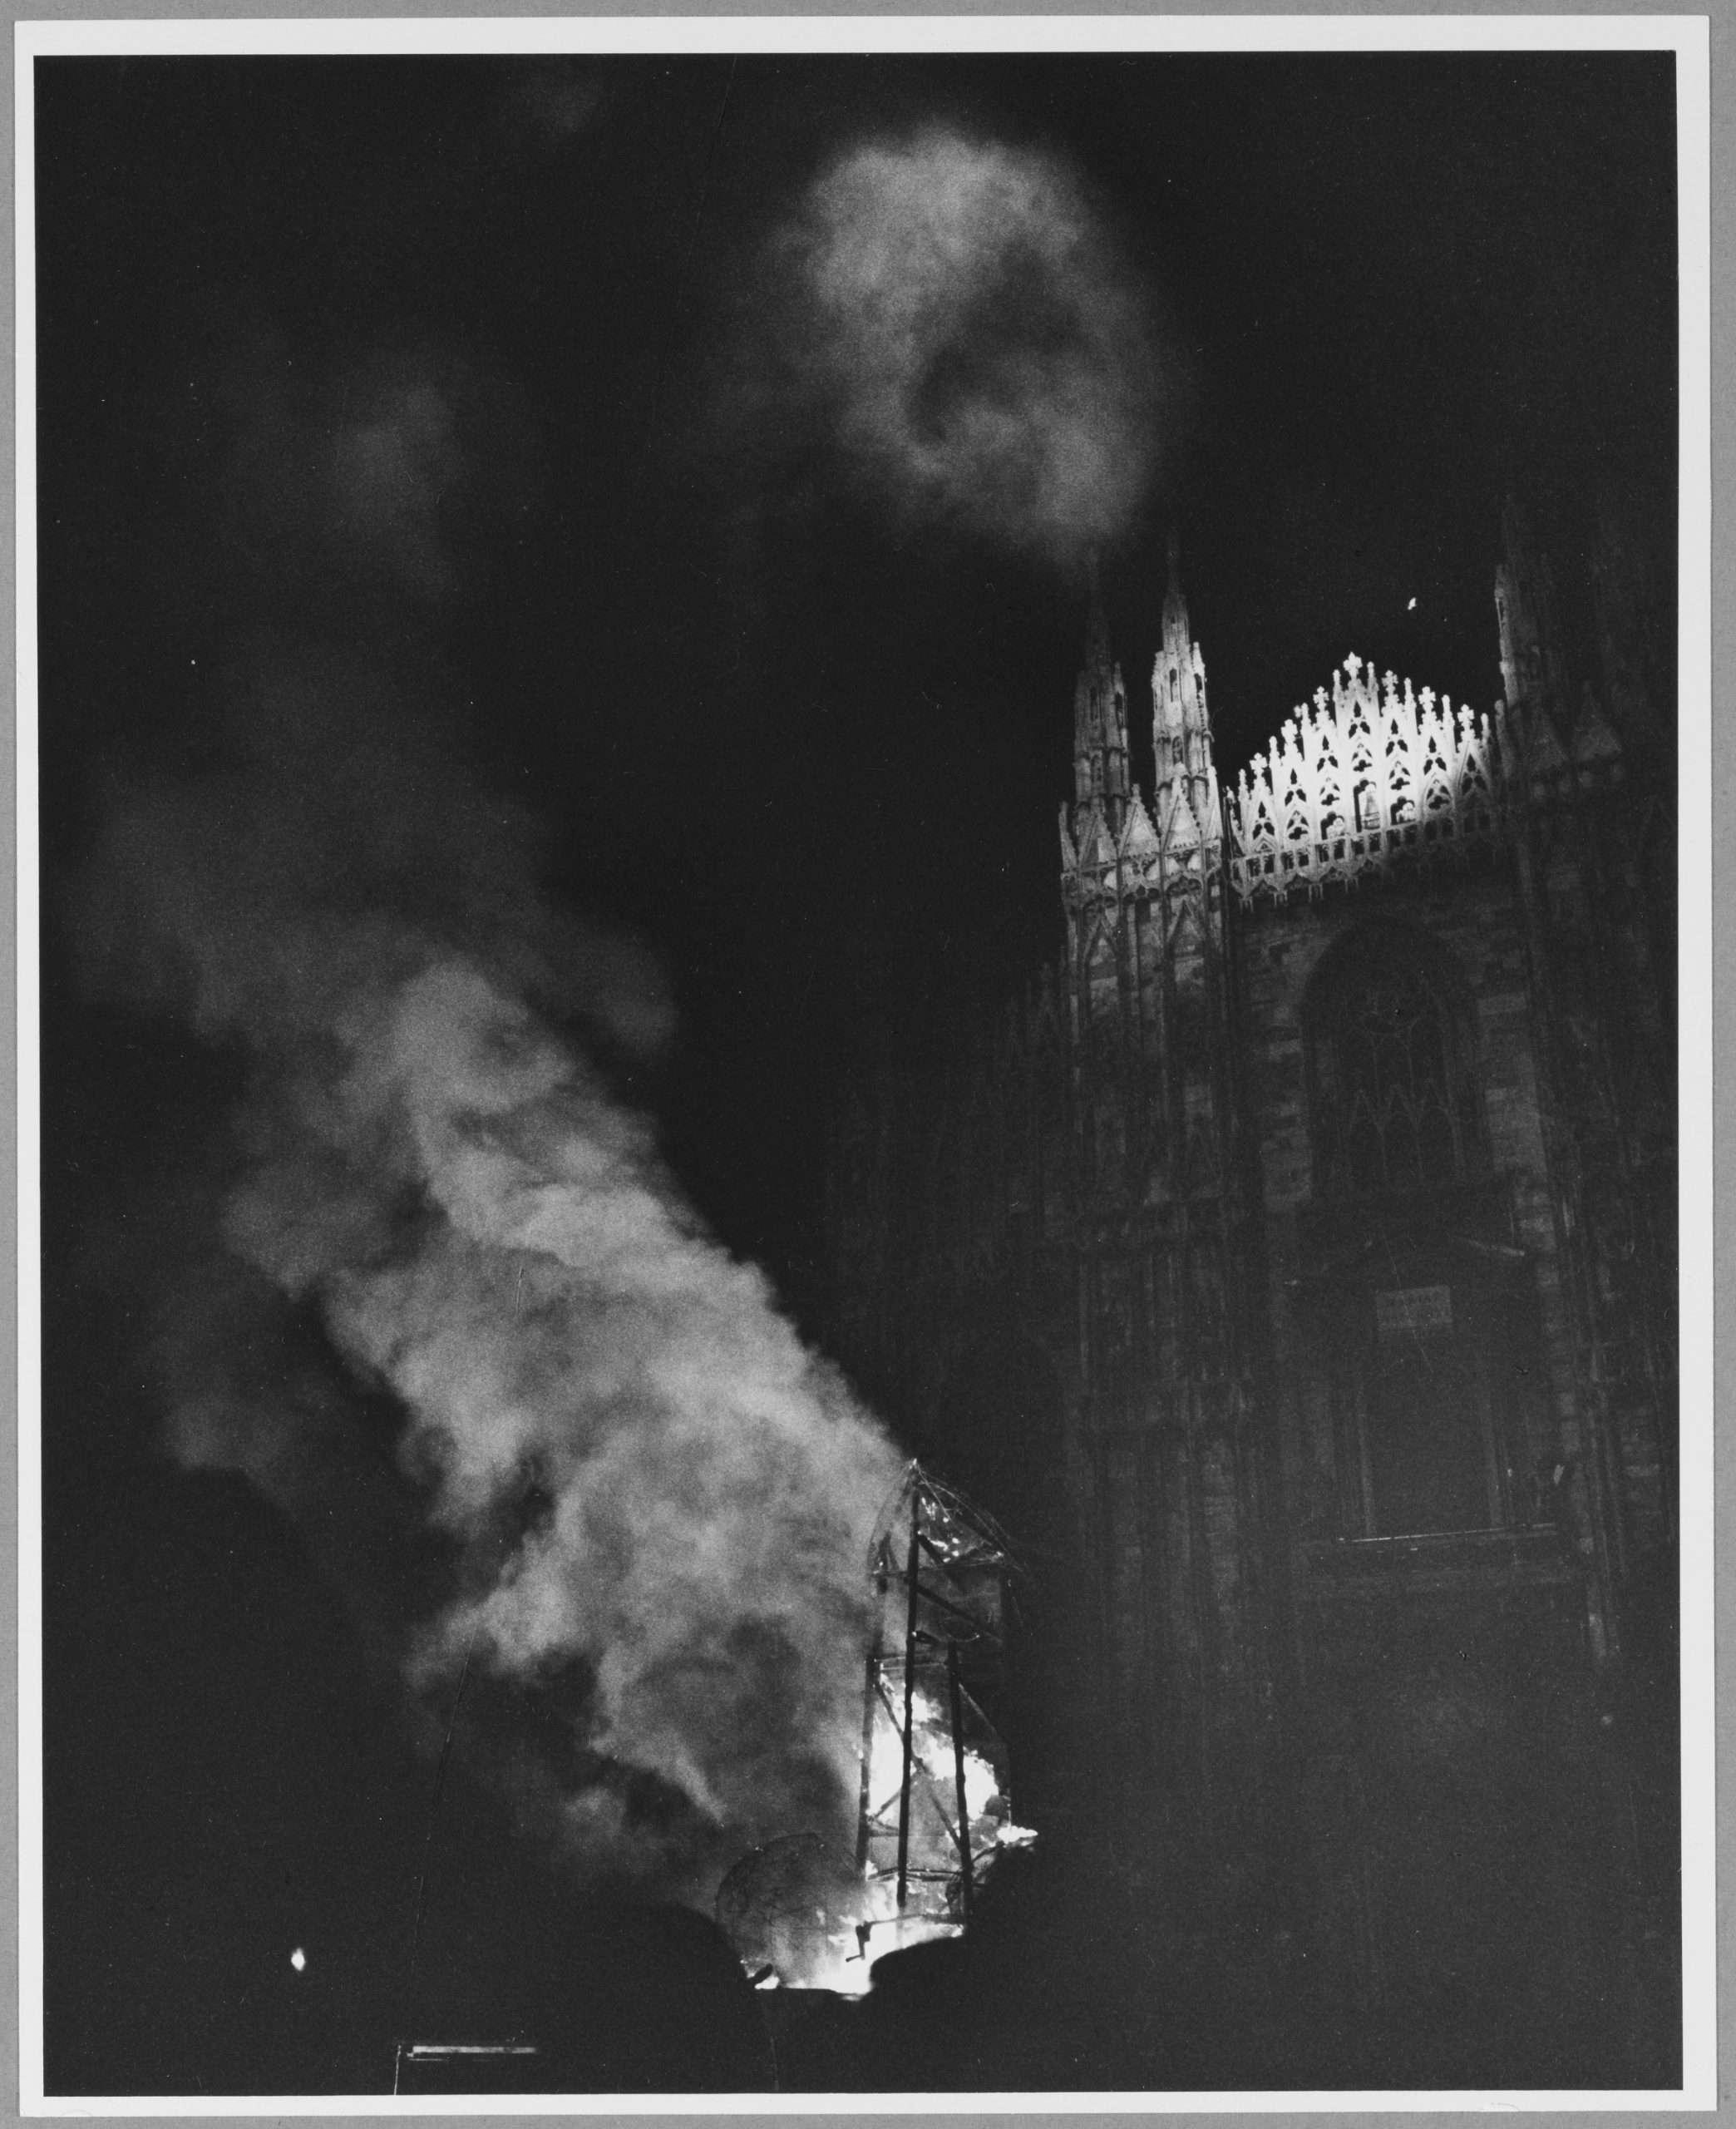 14. Shunk-Kender_Christo et Jeanne-Claude, Monument emballÇ, Milano, 1970